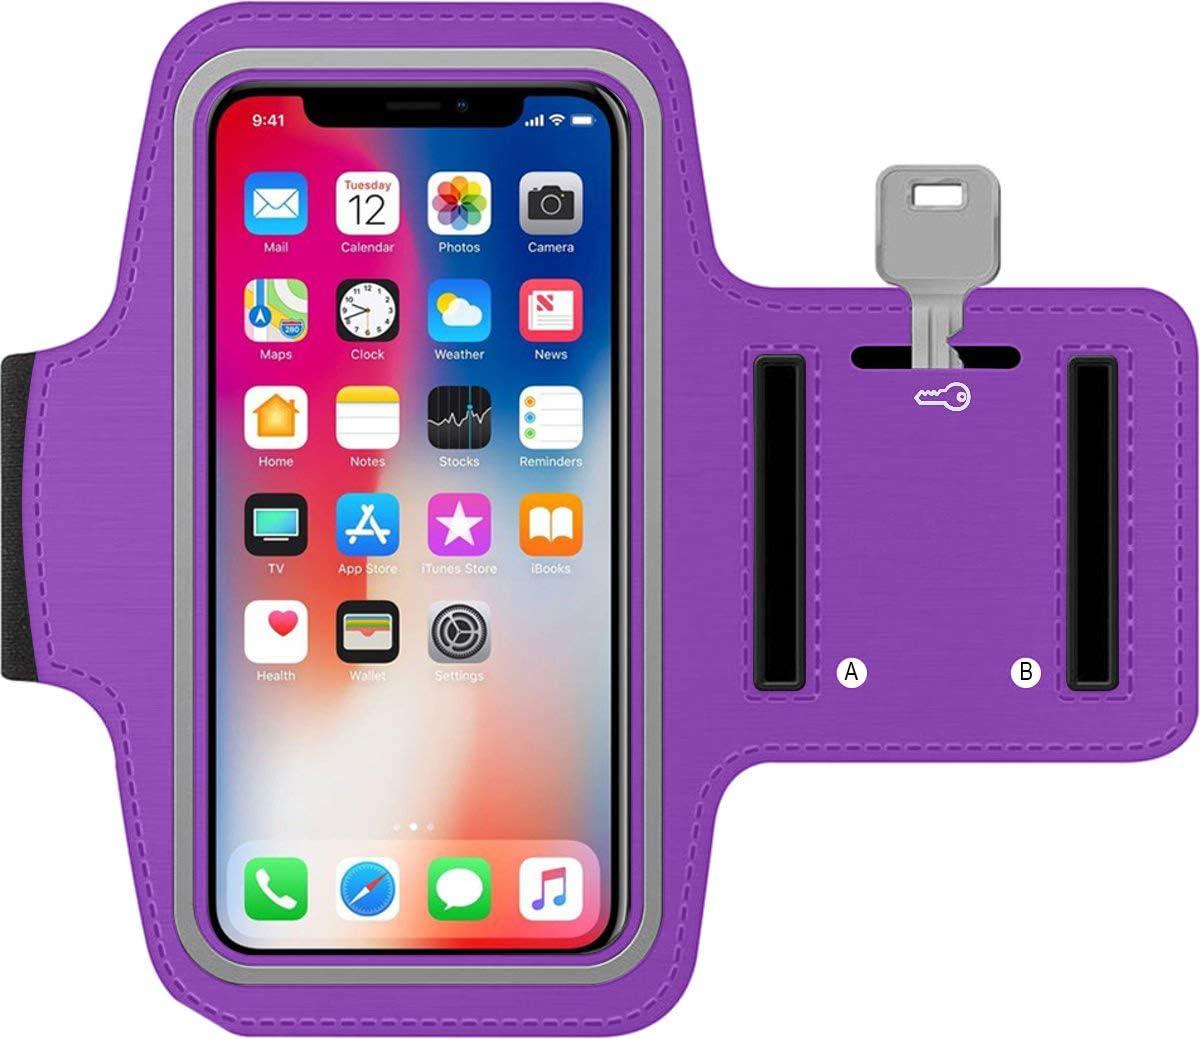 Azul Brazalete Deportivo movil de Neopreno Antideslizante Universal para telefonos moviles de hasta 6.5 antisudor con Bolsillo para Llaves Cable Tarjetas